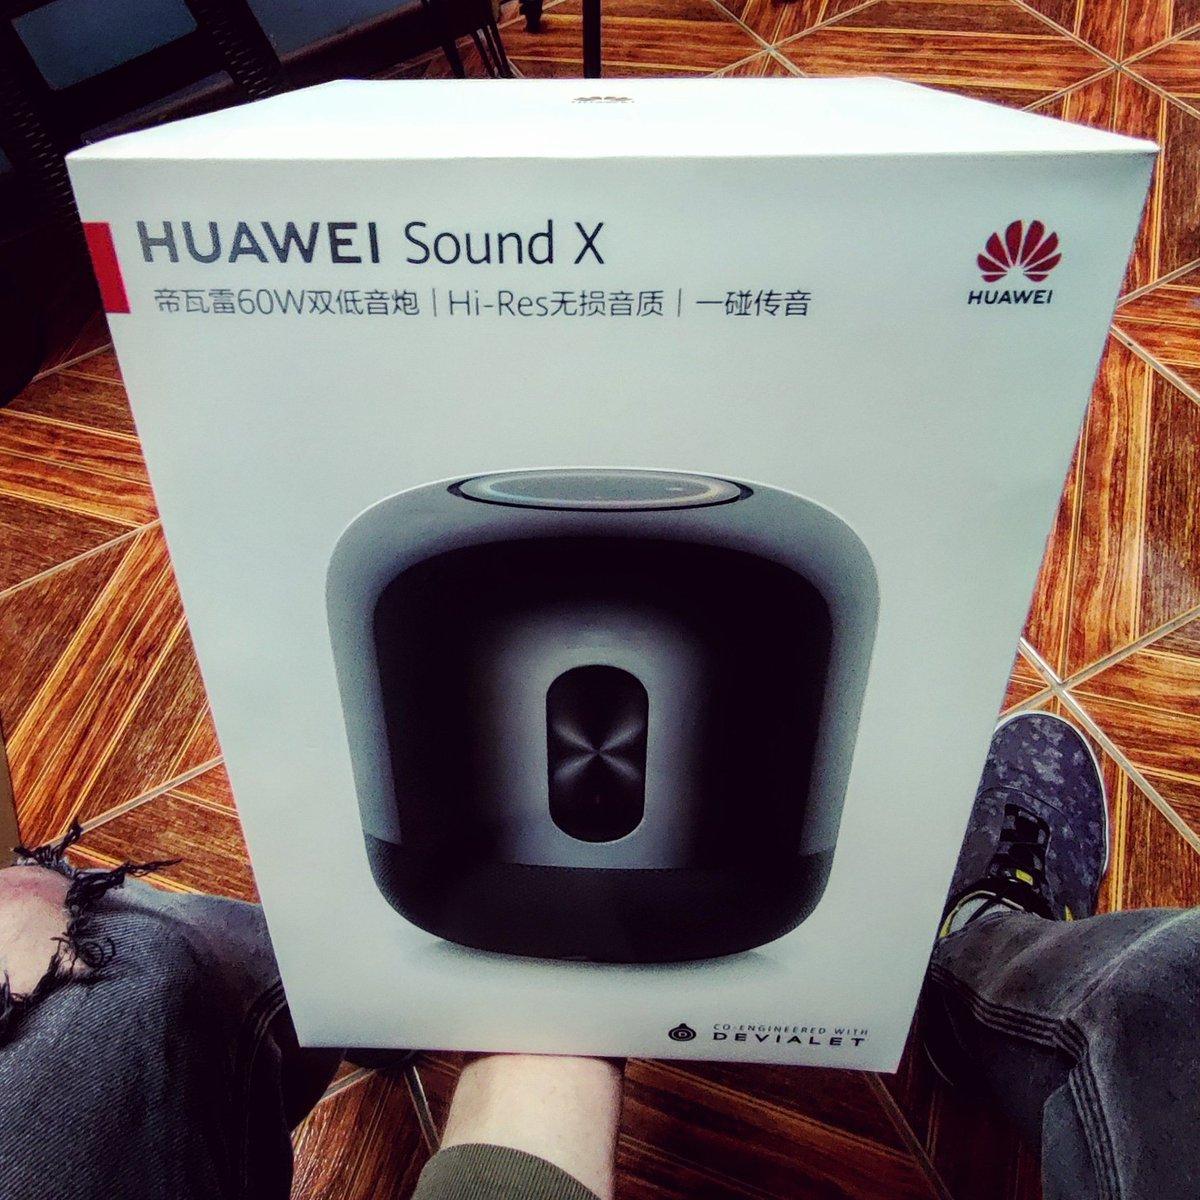 ¡¿60W en este tamaño?! Damn @HuaweiMobileCL #huawei #soundx #speaker #altavoz #parlante #music #nfc #bluetooth #pretty #tech #tecnologia #latinoamerica #chile #santiago https://t.co/WYoKUYs16A